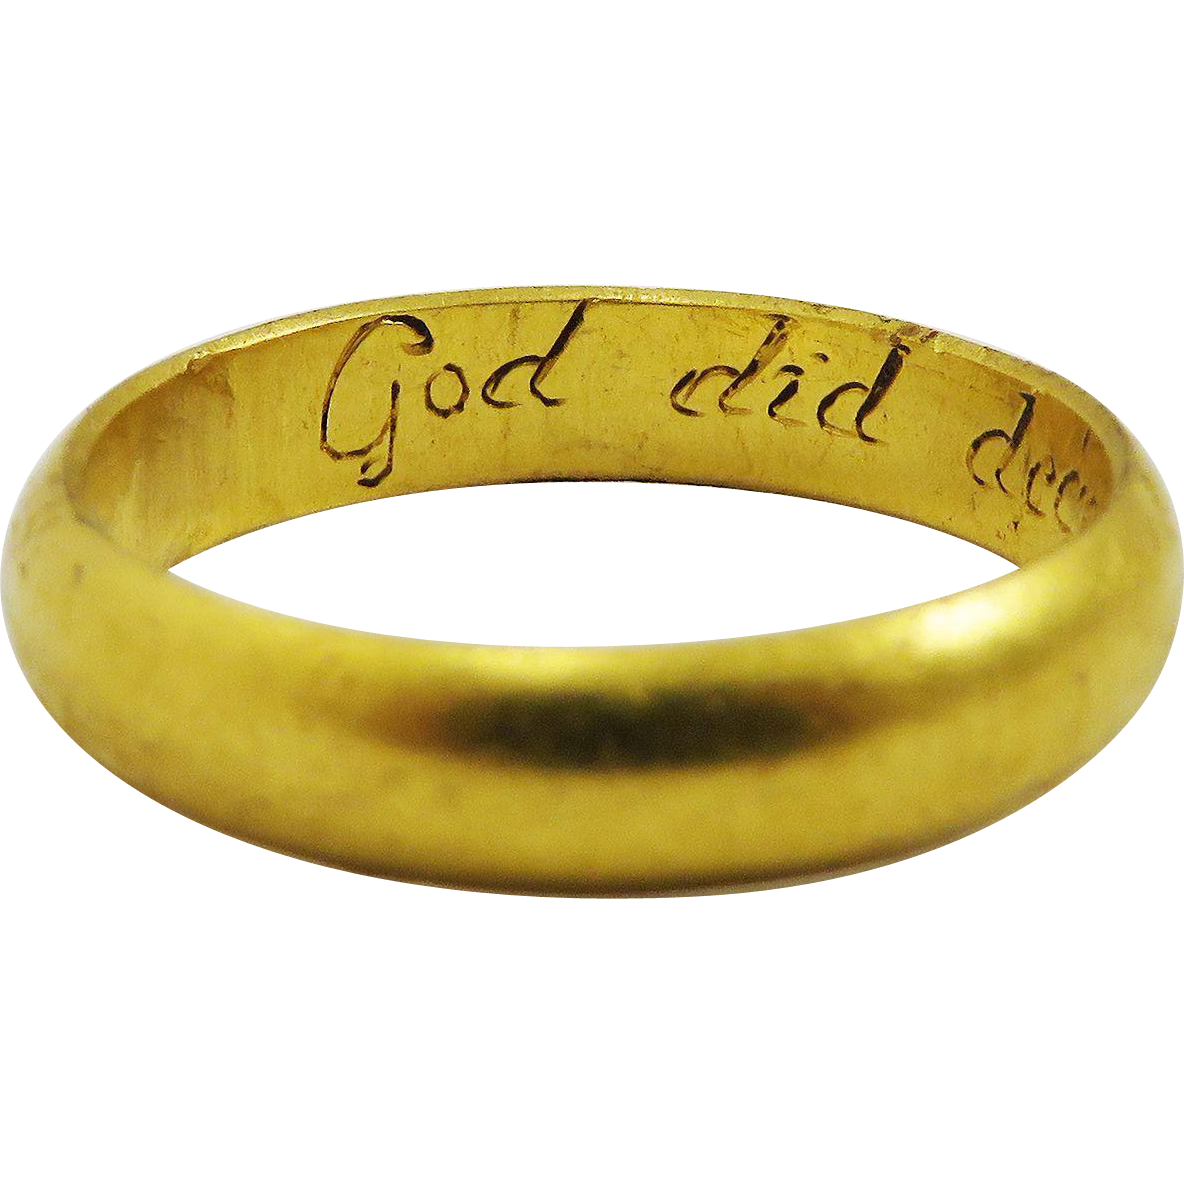 "OUTSTANDING 22k Stuart Posy Wedding Ring, ""God Did Decree Our Unity,"" Maker's Mark, 5.03 Grams, c.1690!"